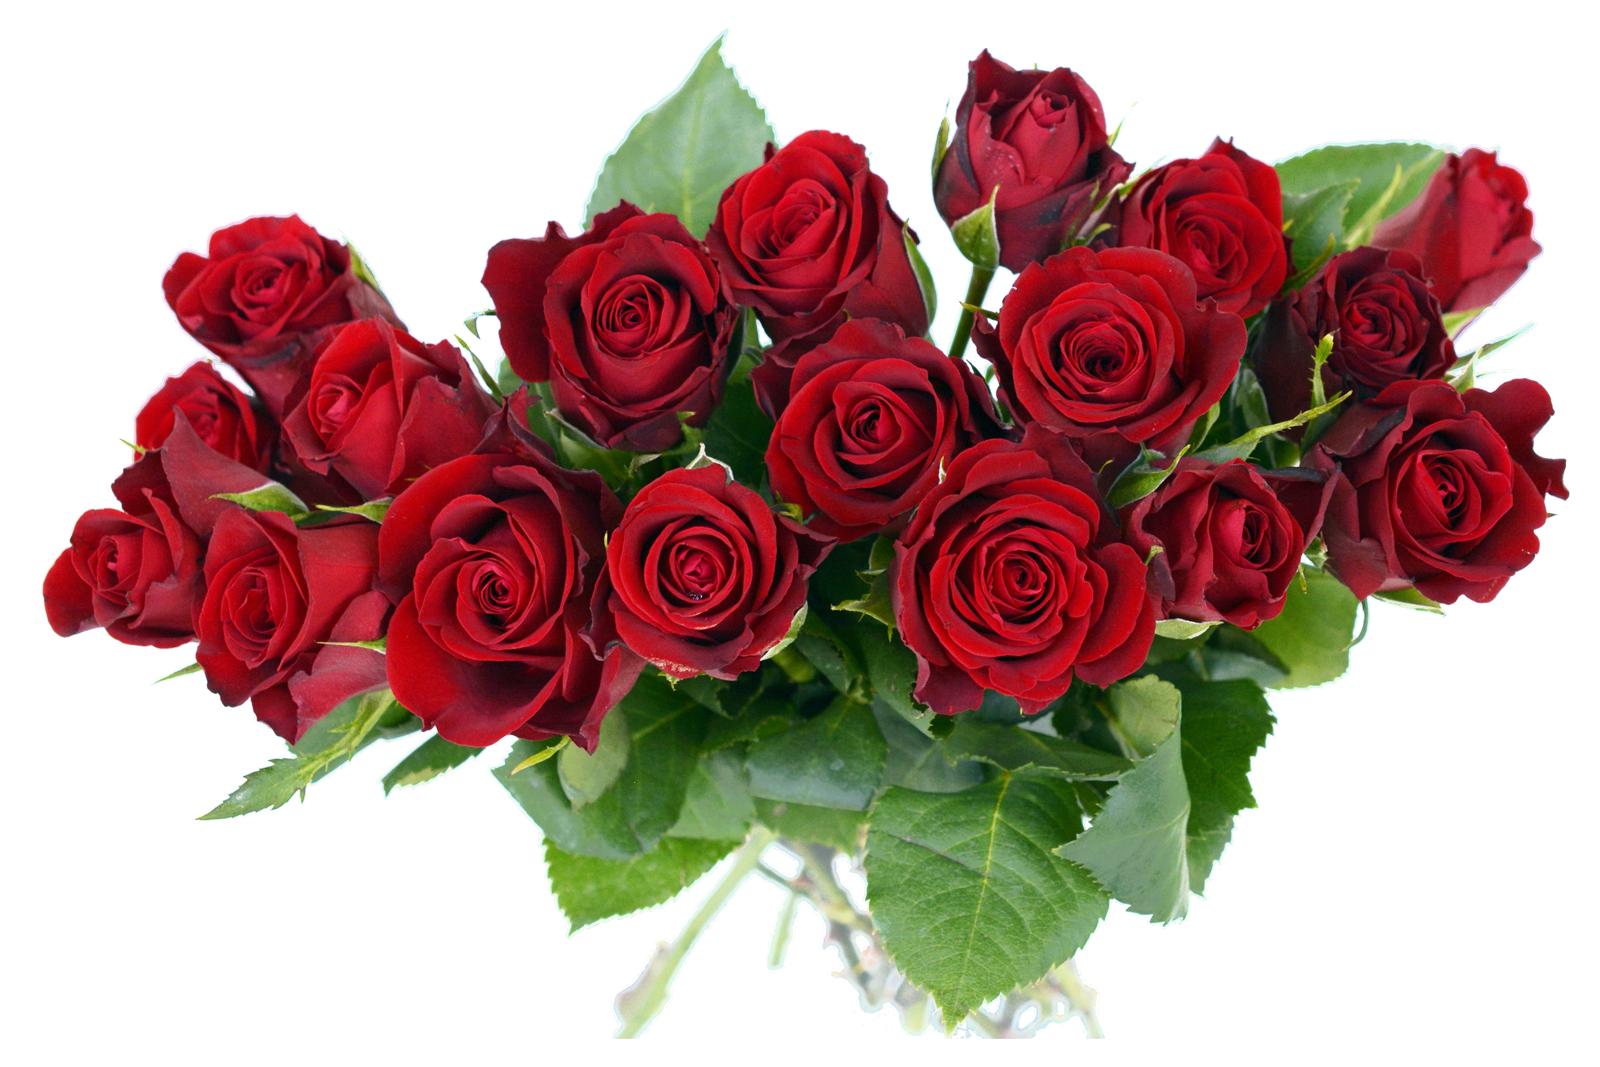 Rose Bouquet PNG Image